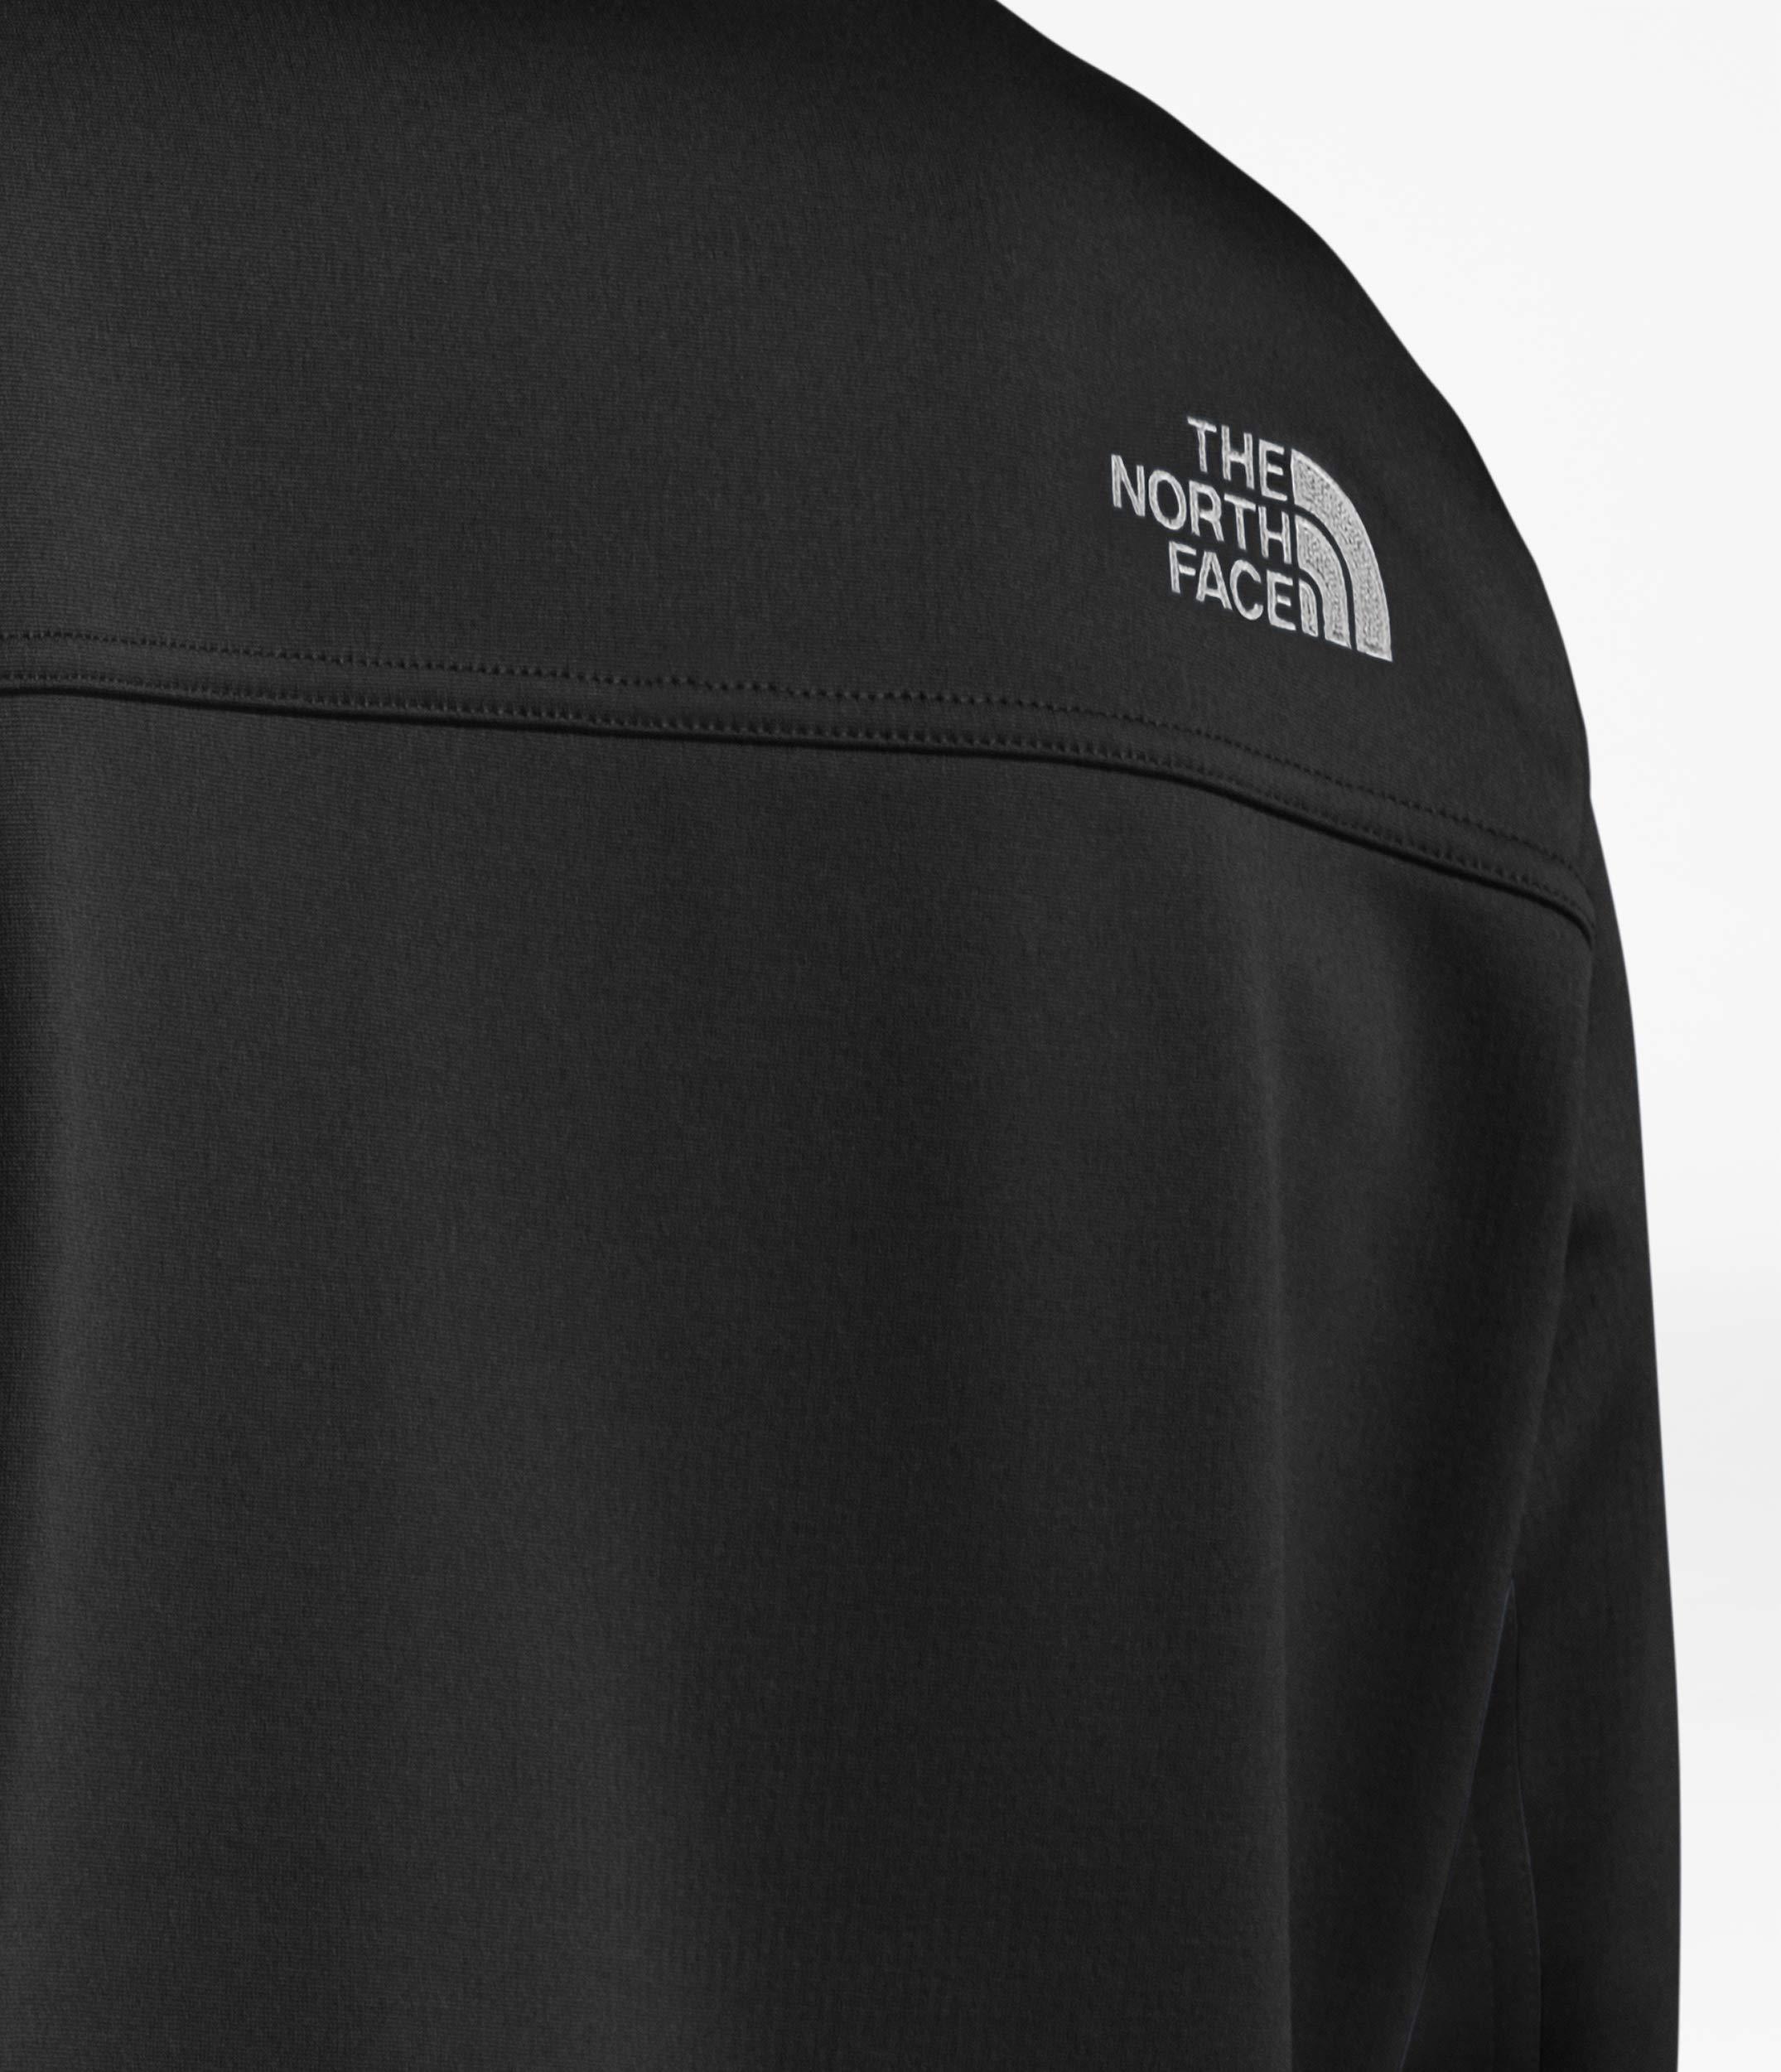 b954442de5 The North Face Men s Apex Canyonwall Jacket - TNF Black   TNF Black - L -  NF0A33QNKX7   Shells   Clothing